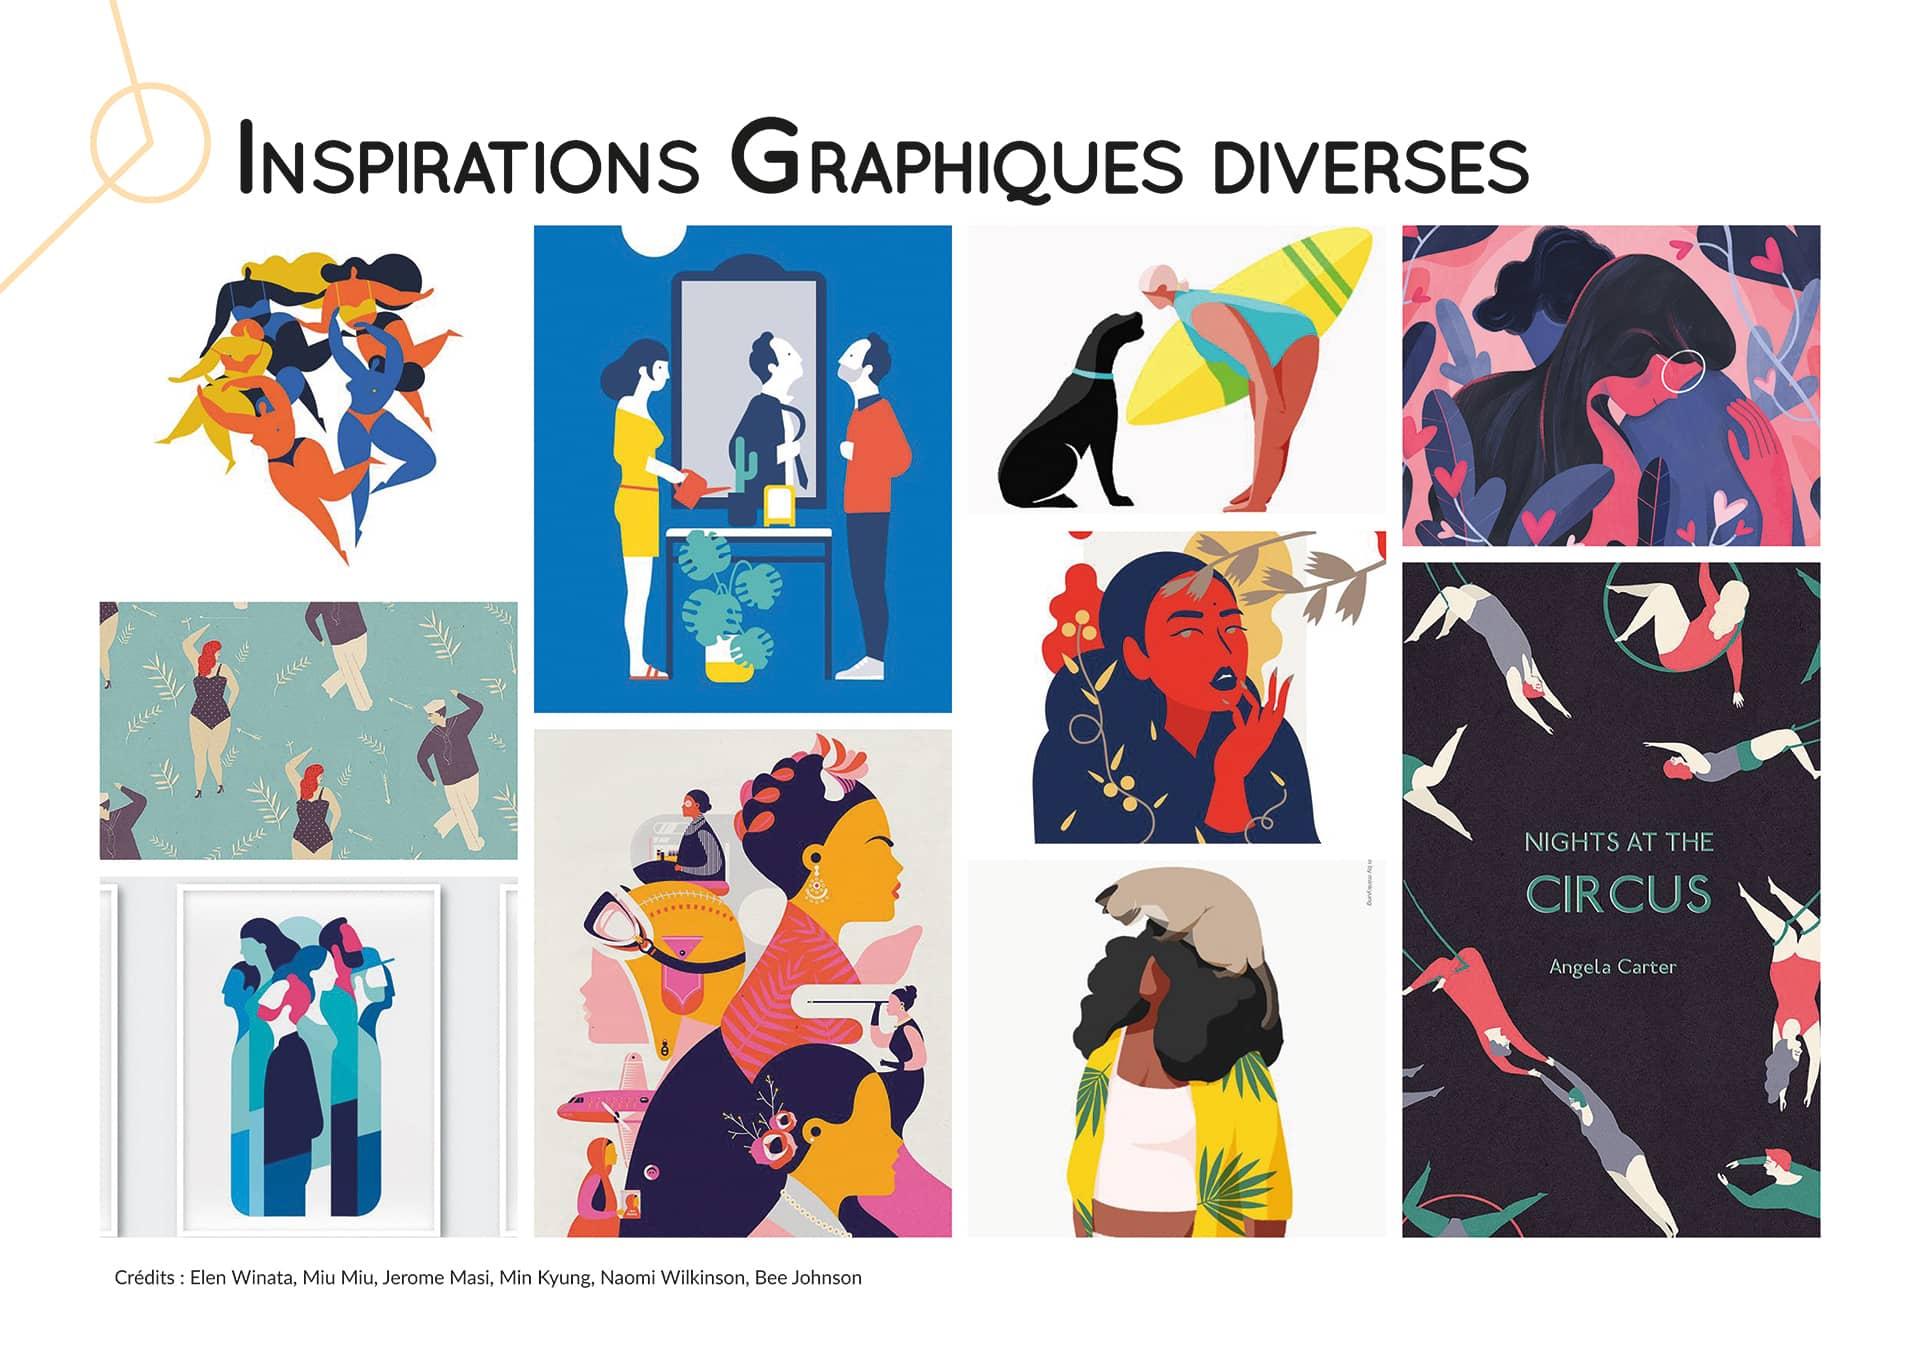 Inspirations graphiques diverses